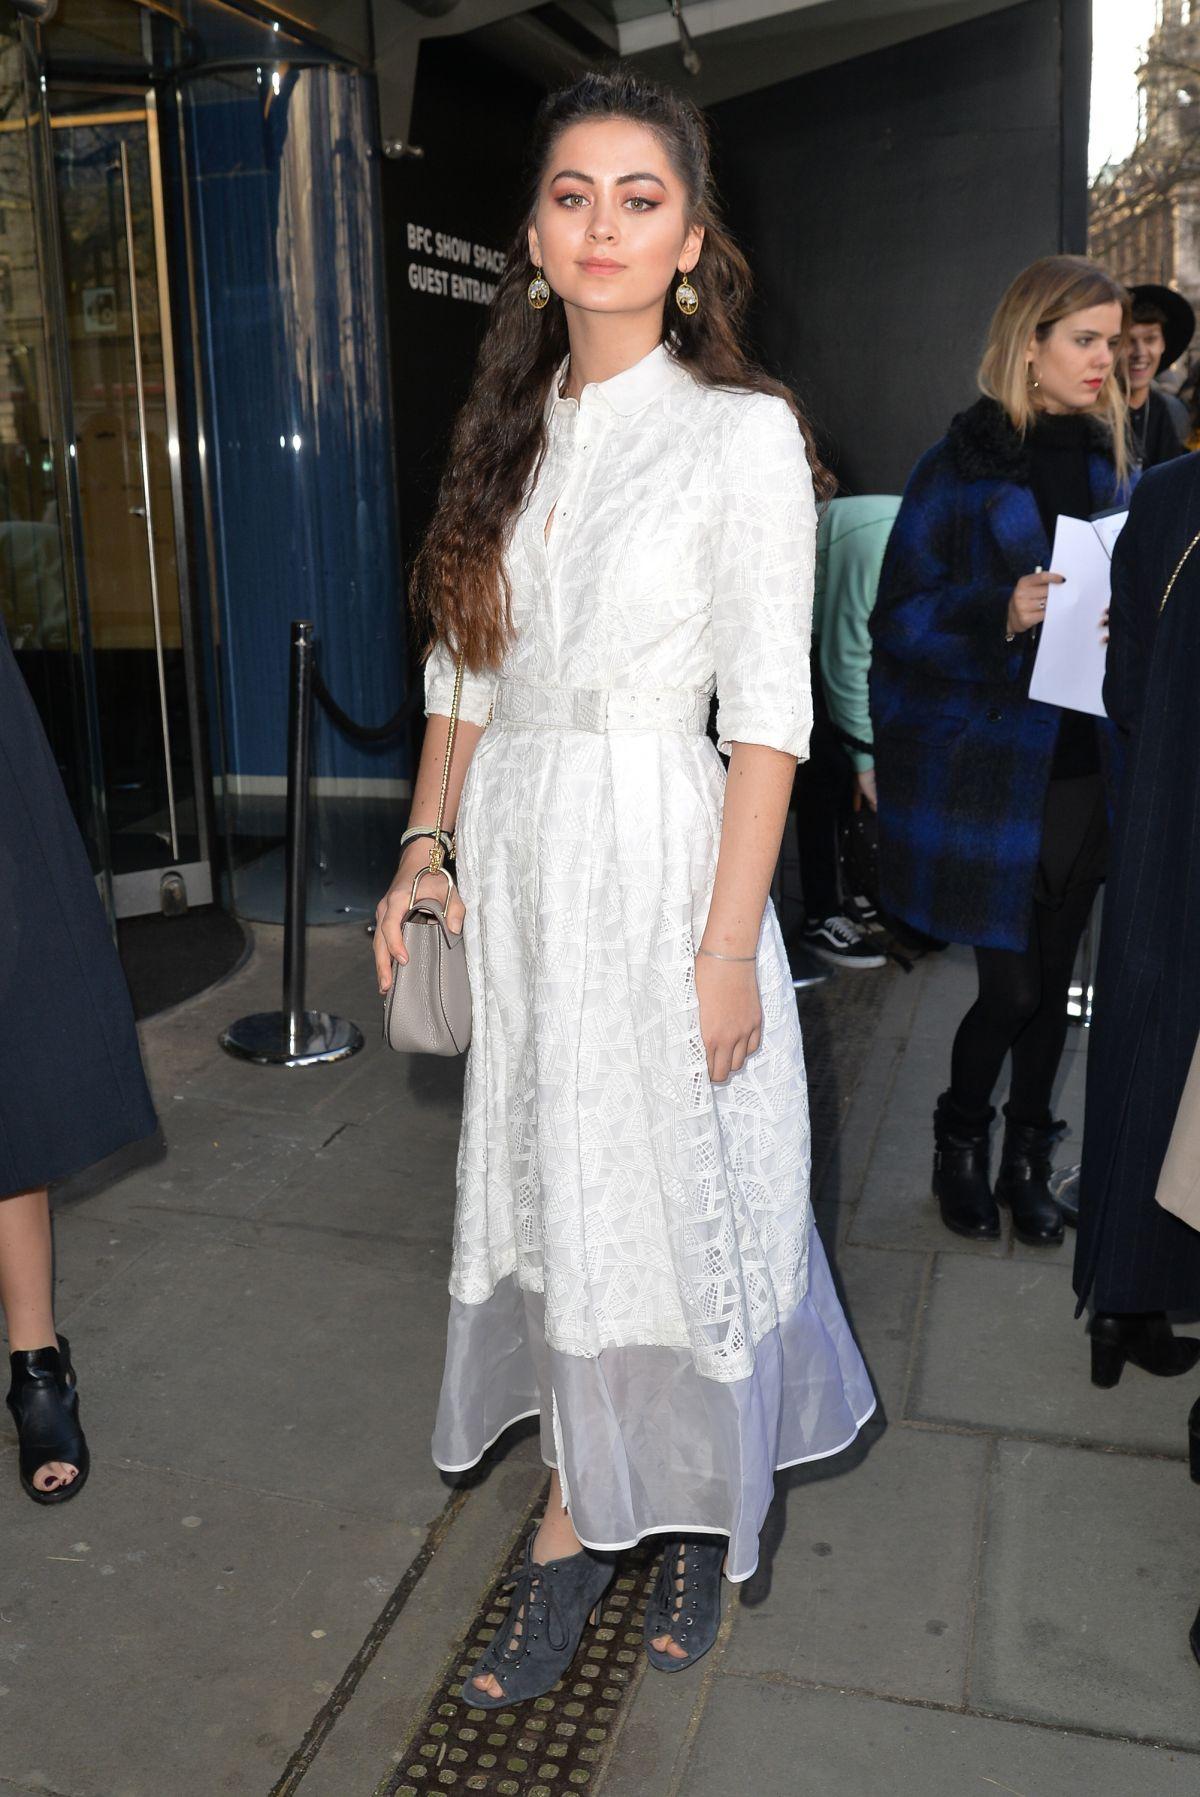 JASMNE THOMPSON at Bora Aksu Fashion Show at London Fashion Week 02/17/2017